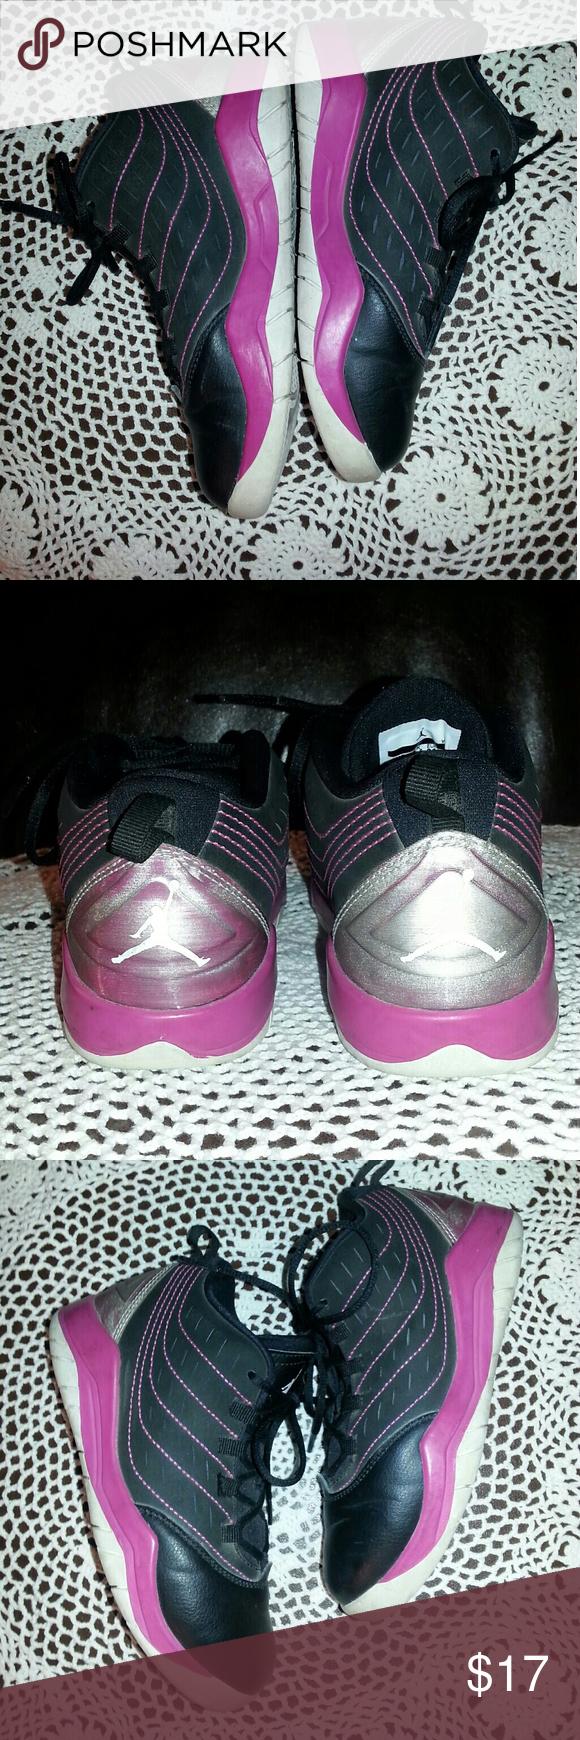 Air Jordan Girls Air Jordan size 13c. In good condition, has dirt on the bottom and normal wear and tear. Air Jordan Shoes Sneakers